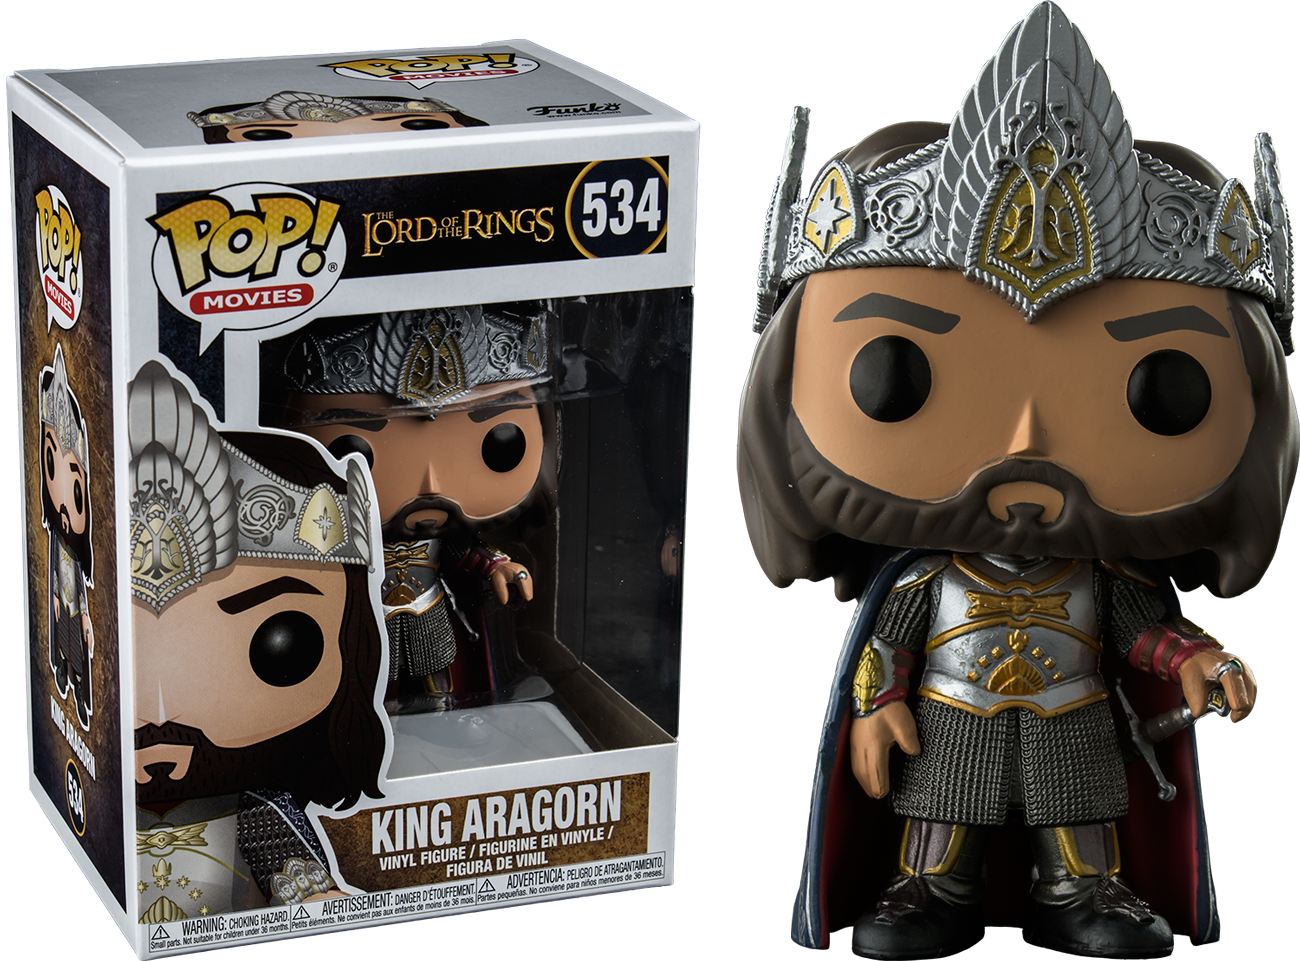 Lord of the Rings - King Aragorn Pop! Vinyl Figure